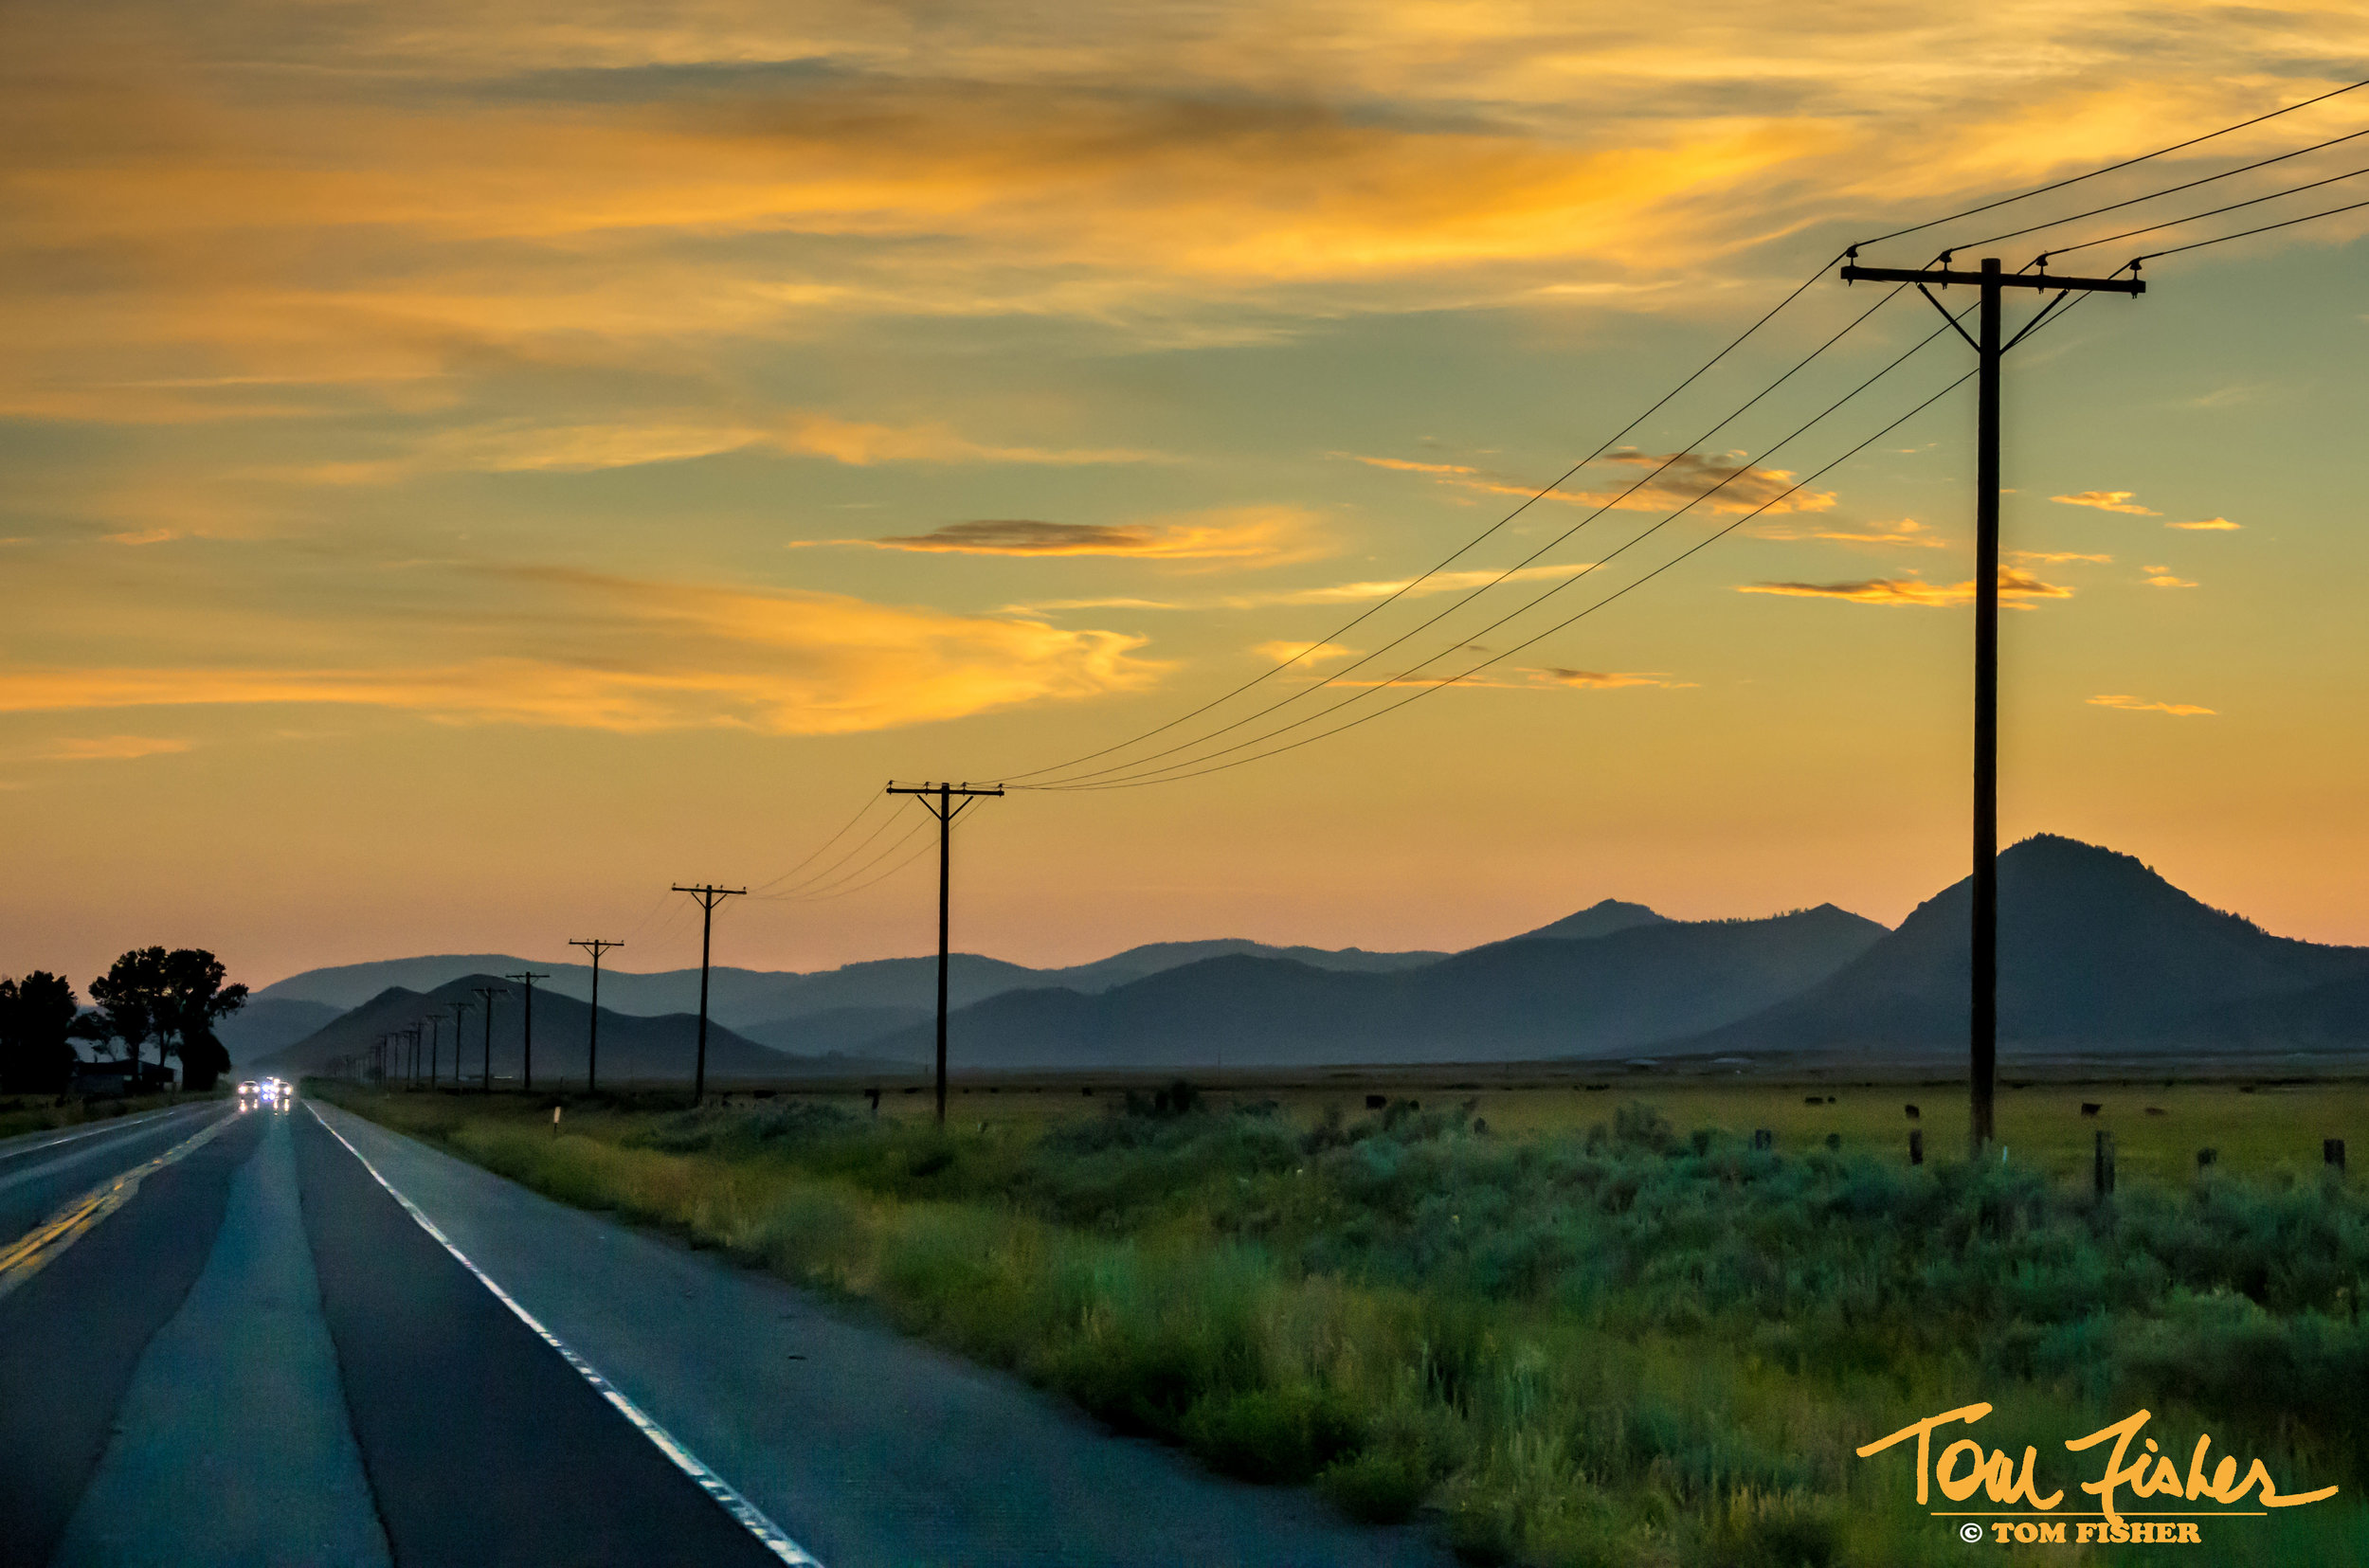 The Road to Portola